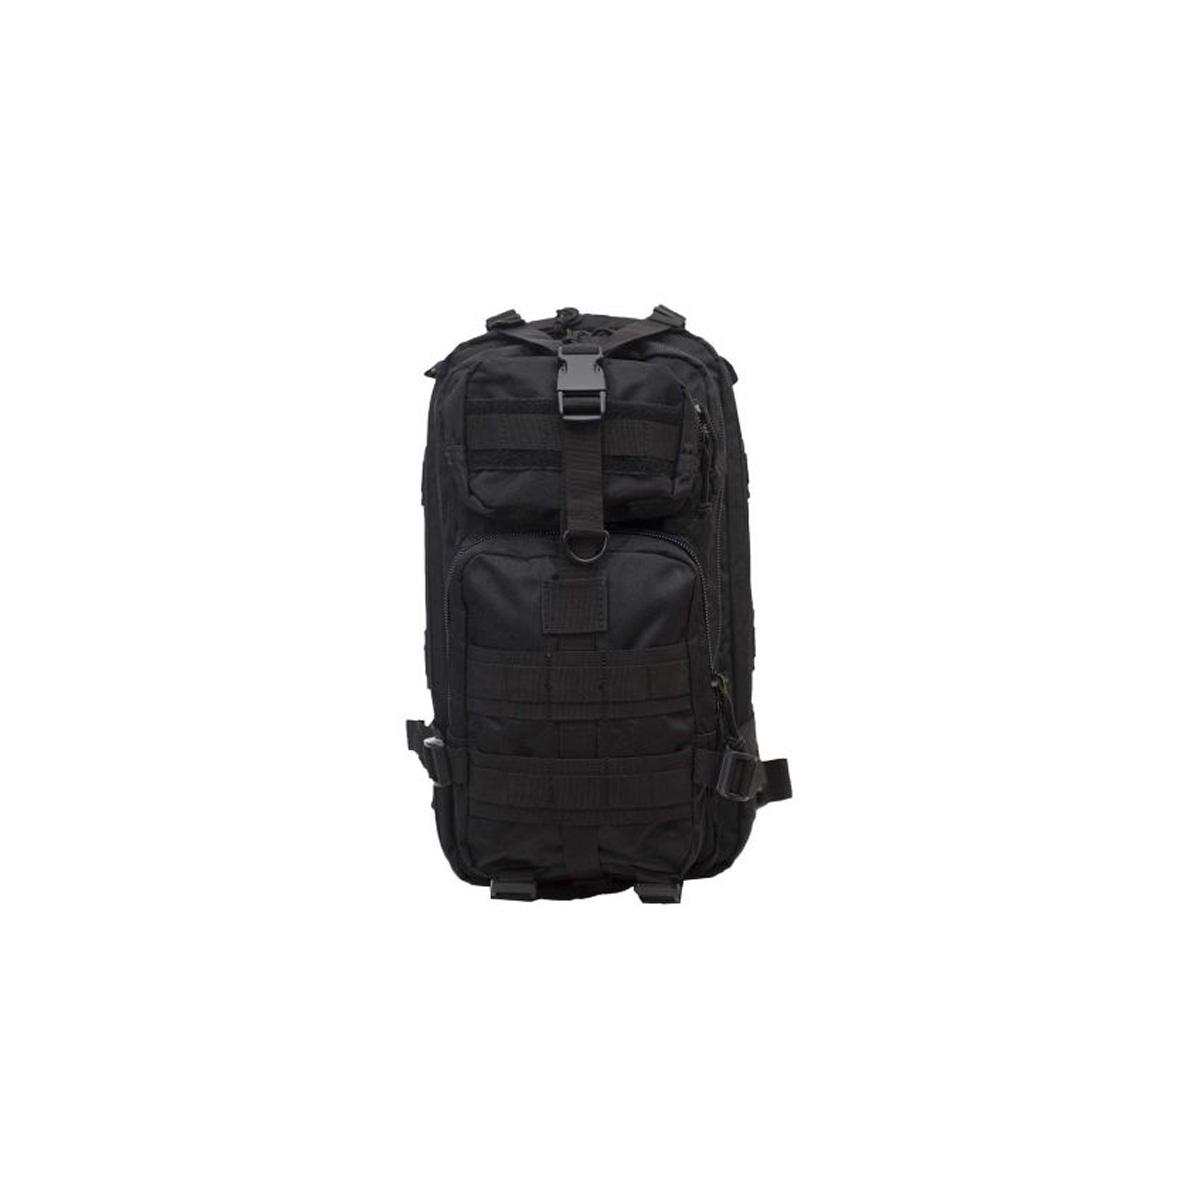 Medium Tactical Transport Backpack, Black, swatch